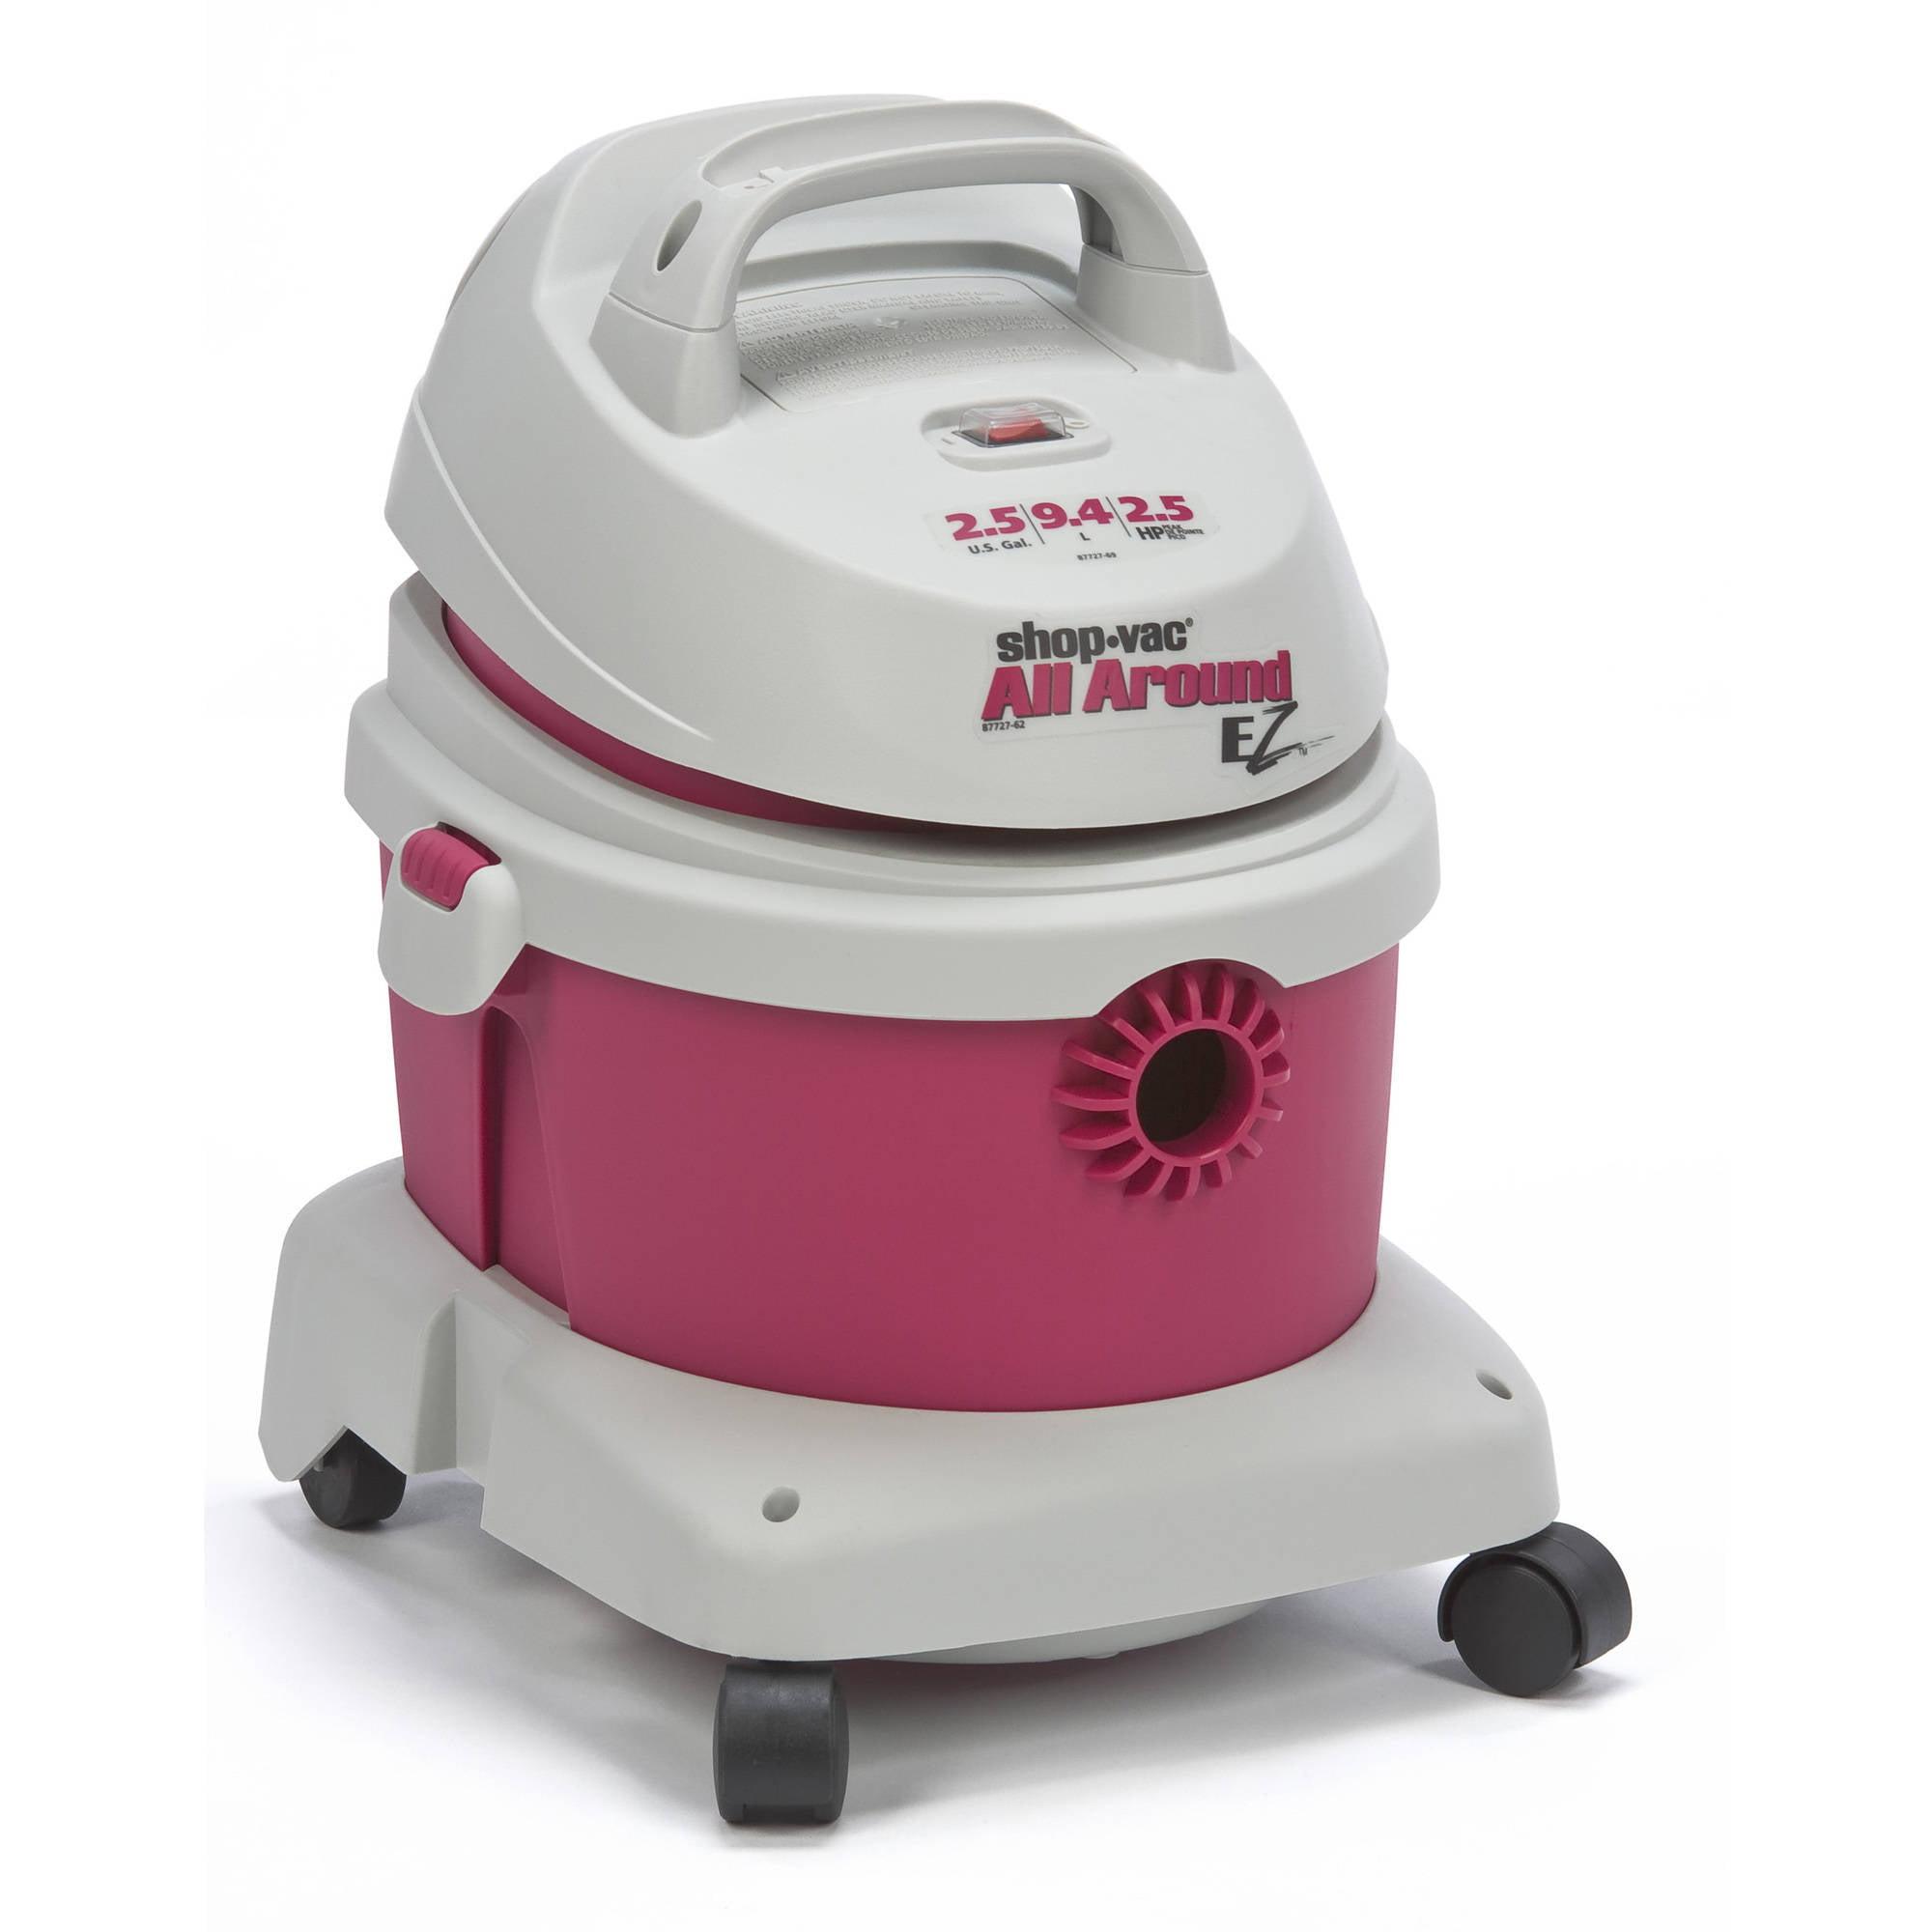 Shop-Vac 2.5-Gallon All Around Wet/Dry Vacuum